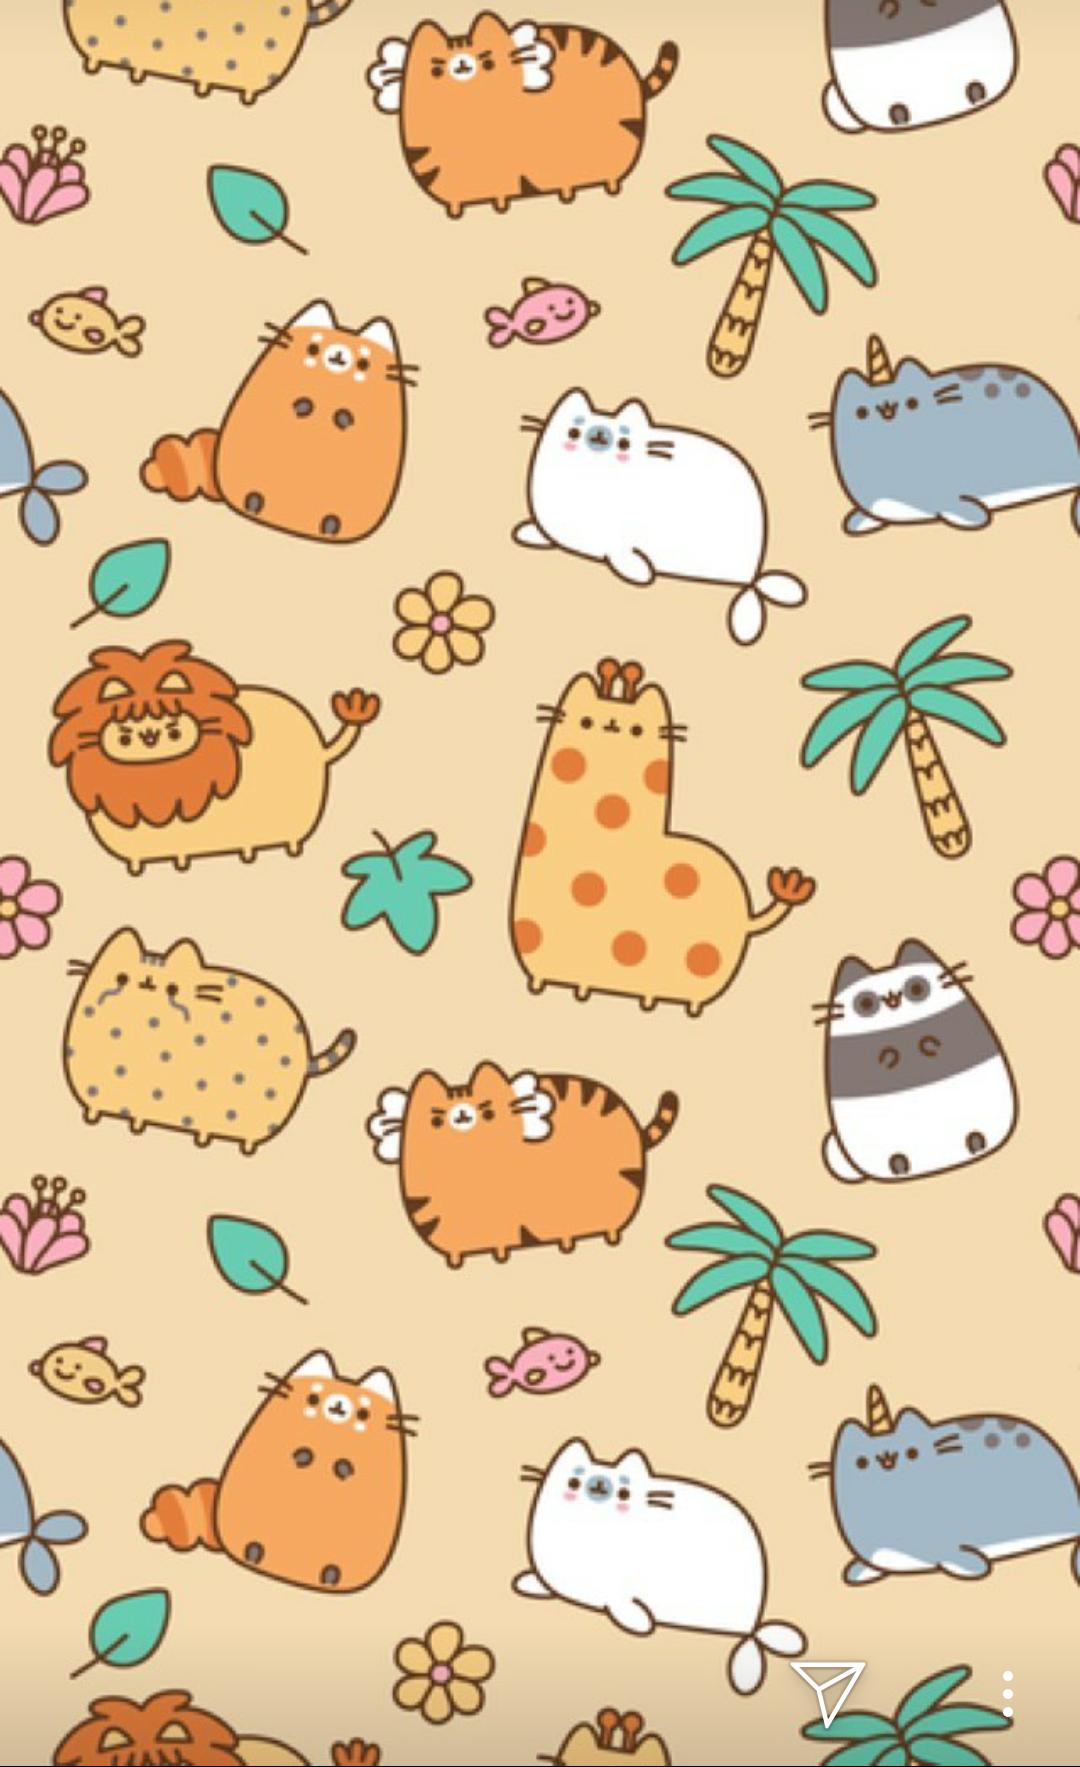 Pusheen Animals Phone Wallpaper 可愛い待ち受け 可愛いイラスト